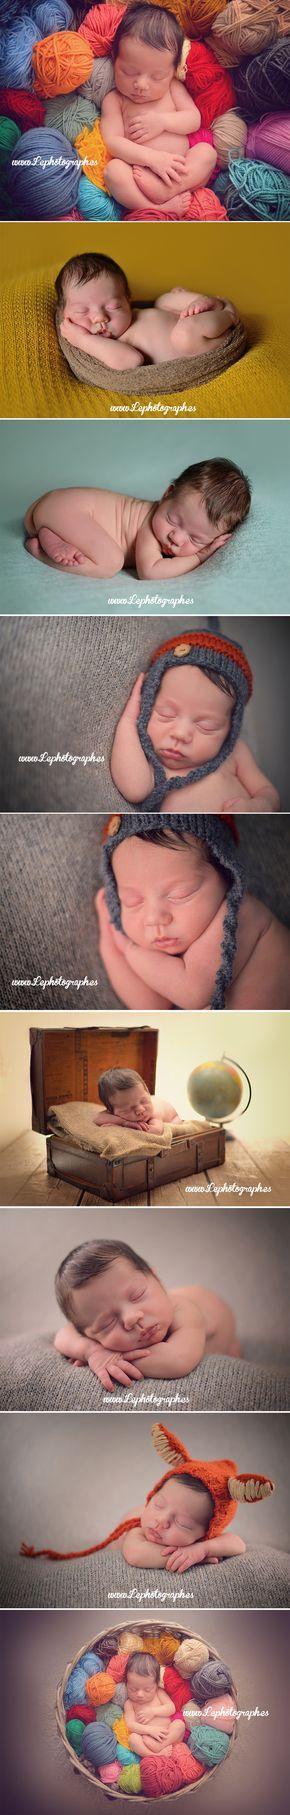 fotografos-de-bebes-recien-nacidos-bilbao-reportaje-fotos